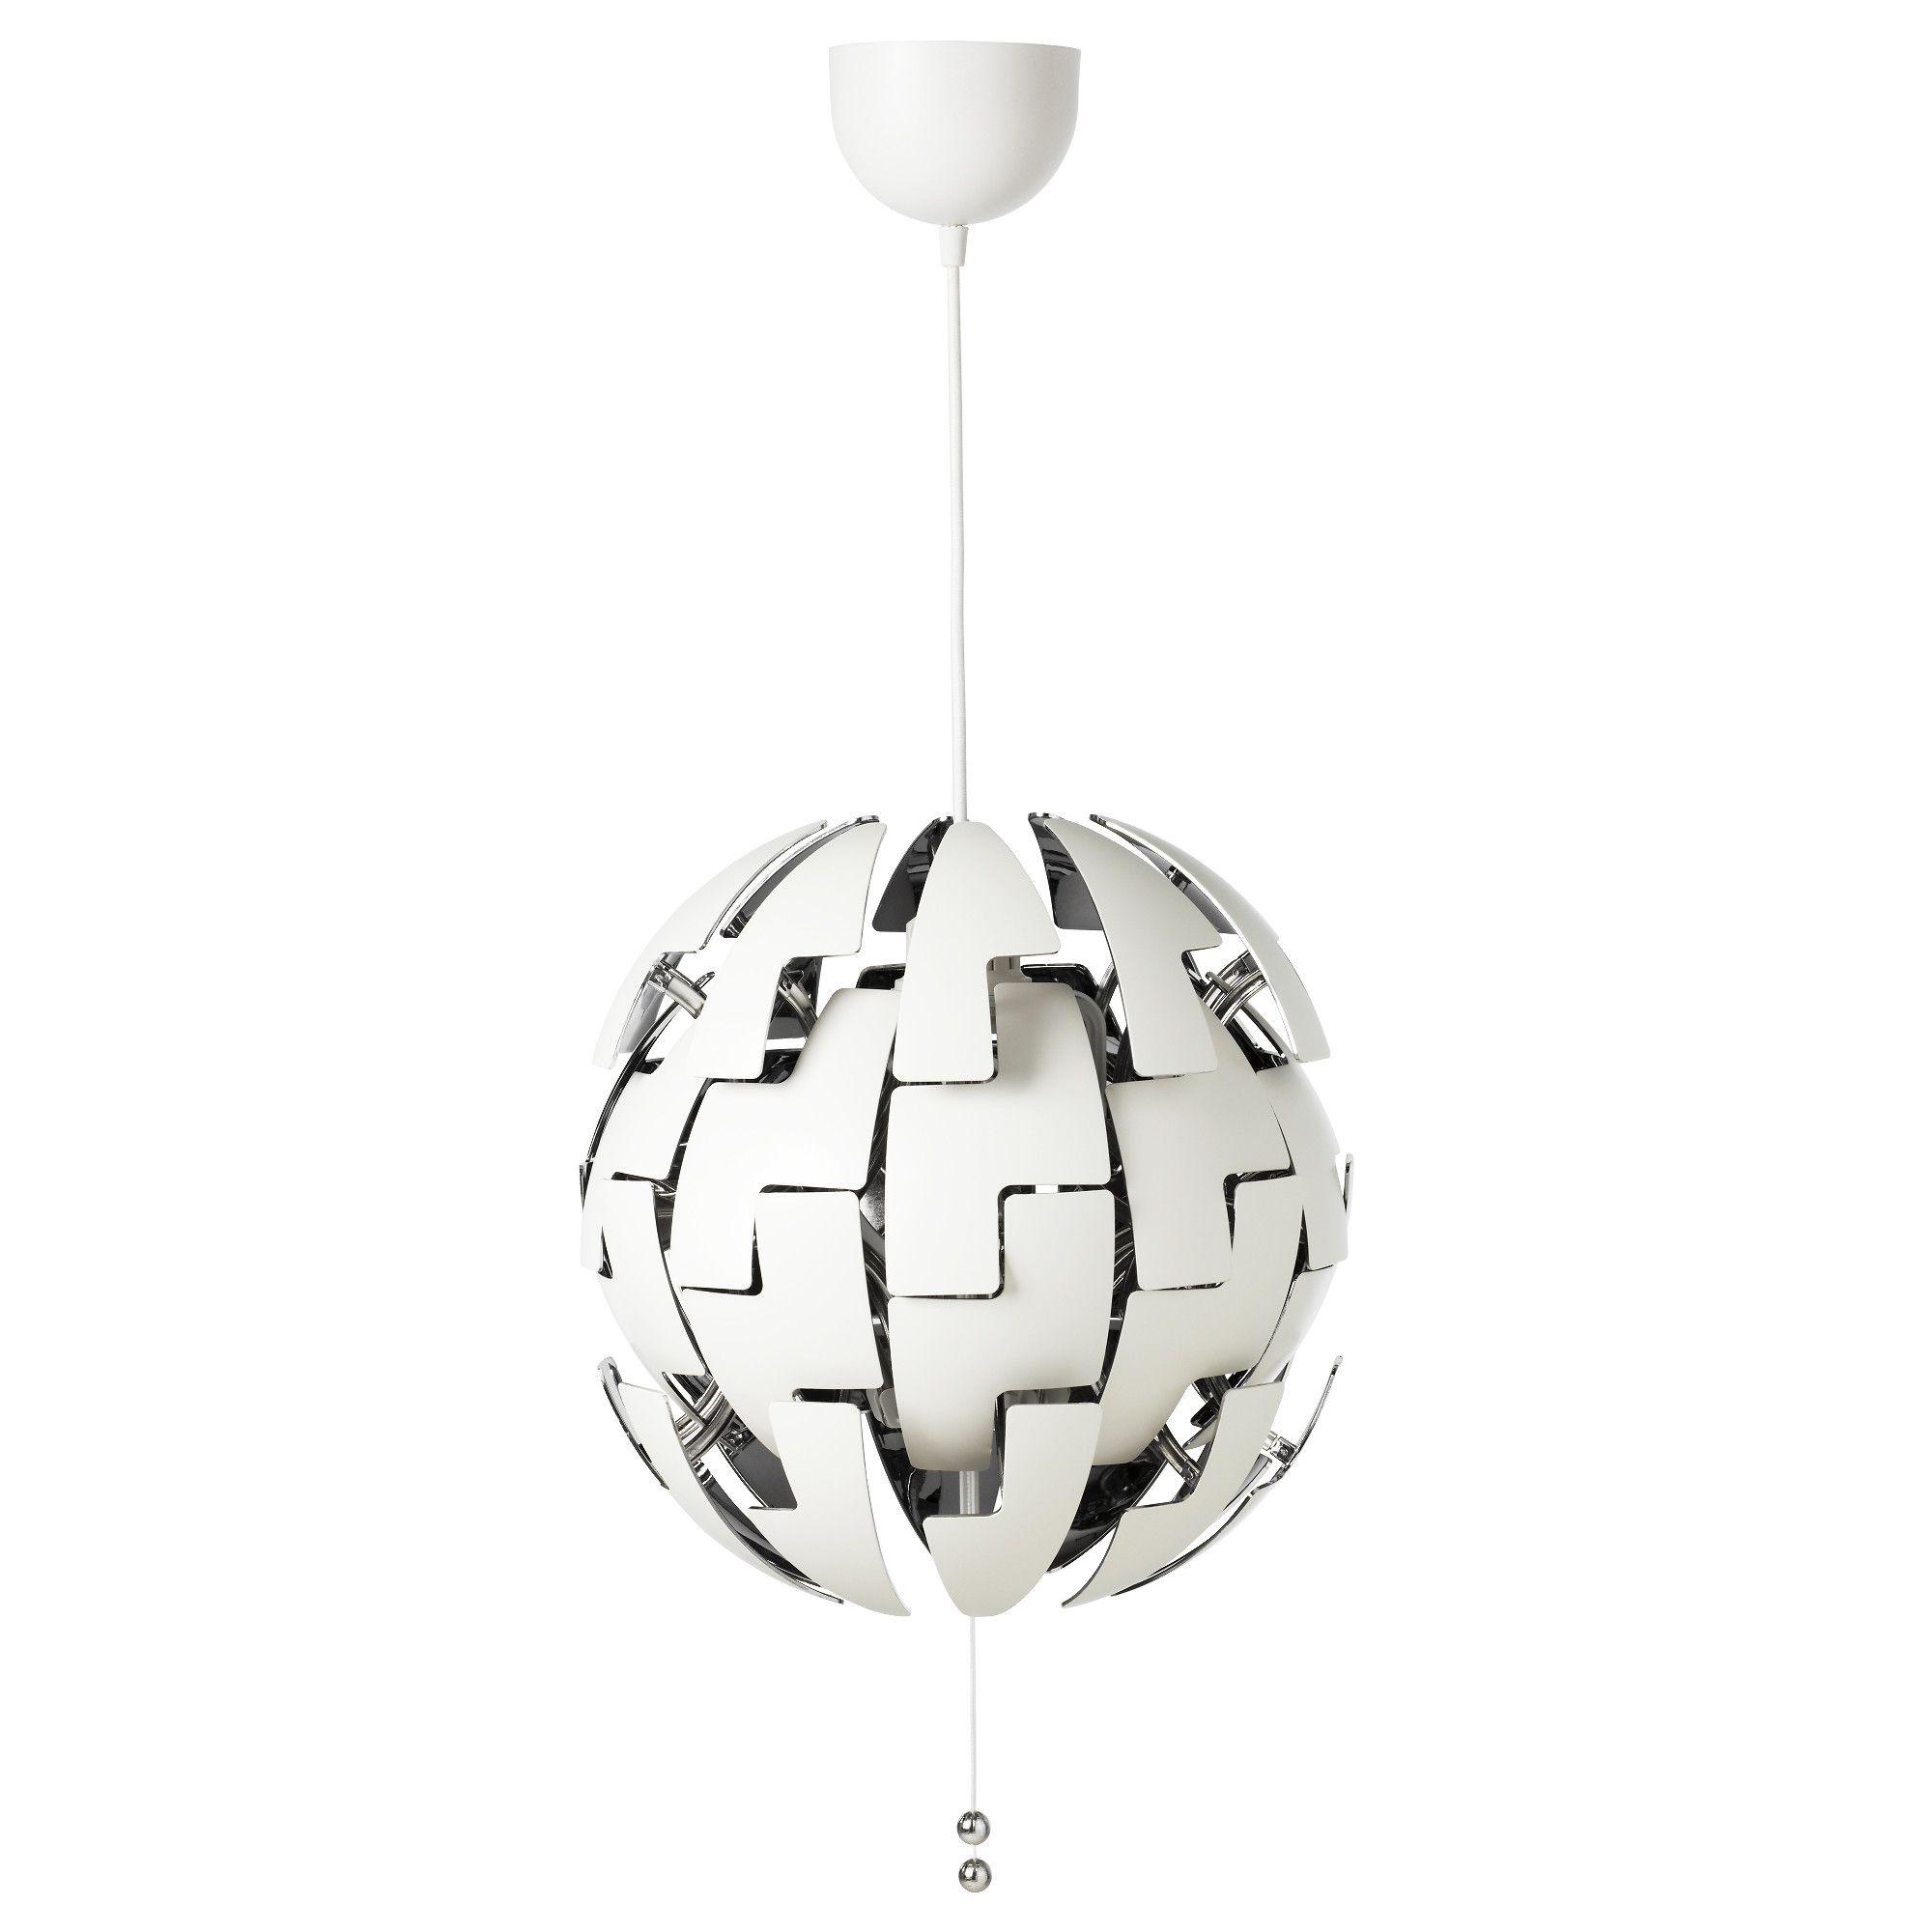 Ikea Ps 2014 Hangeleuchte Weiss A Jetzt Bestellen Unter Https